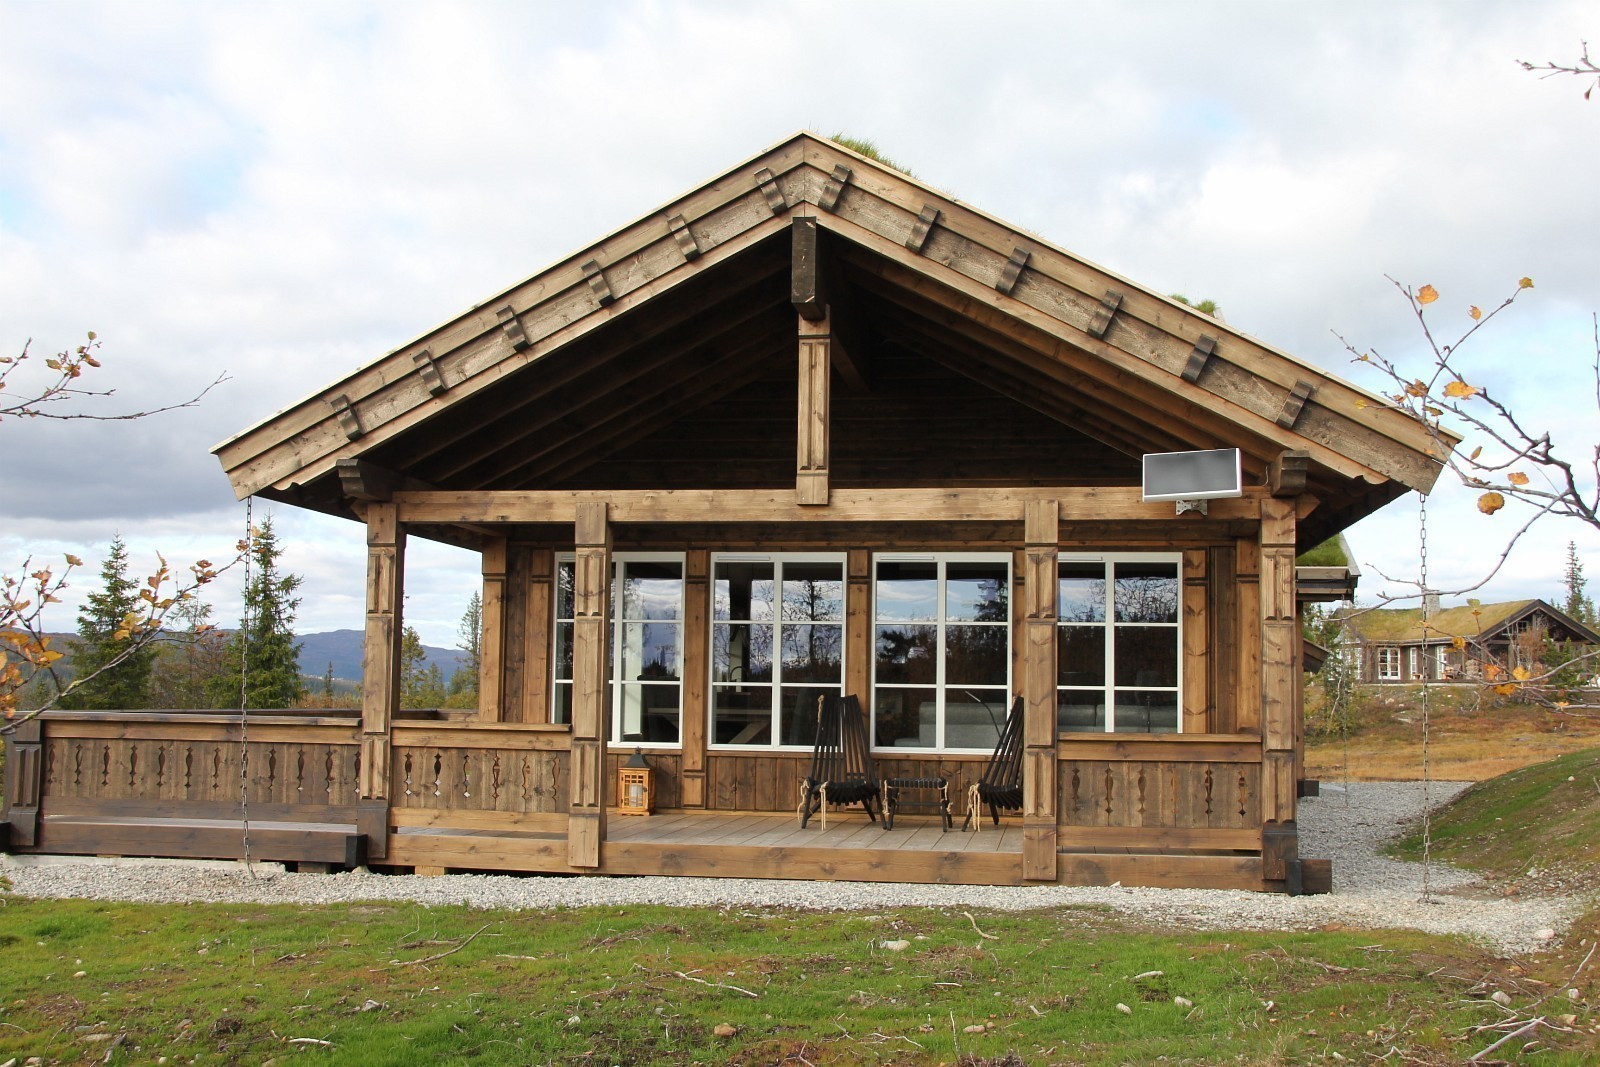 Bilde fra en tilsvarende hytte - kundetilpasninger kan forekomme. Ekstra vinduer er tilvalg.